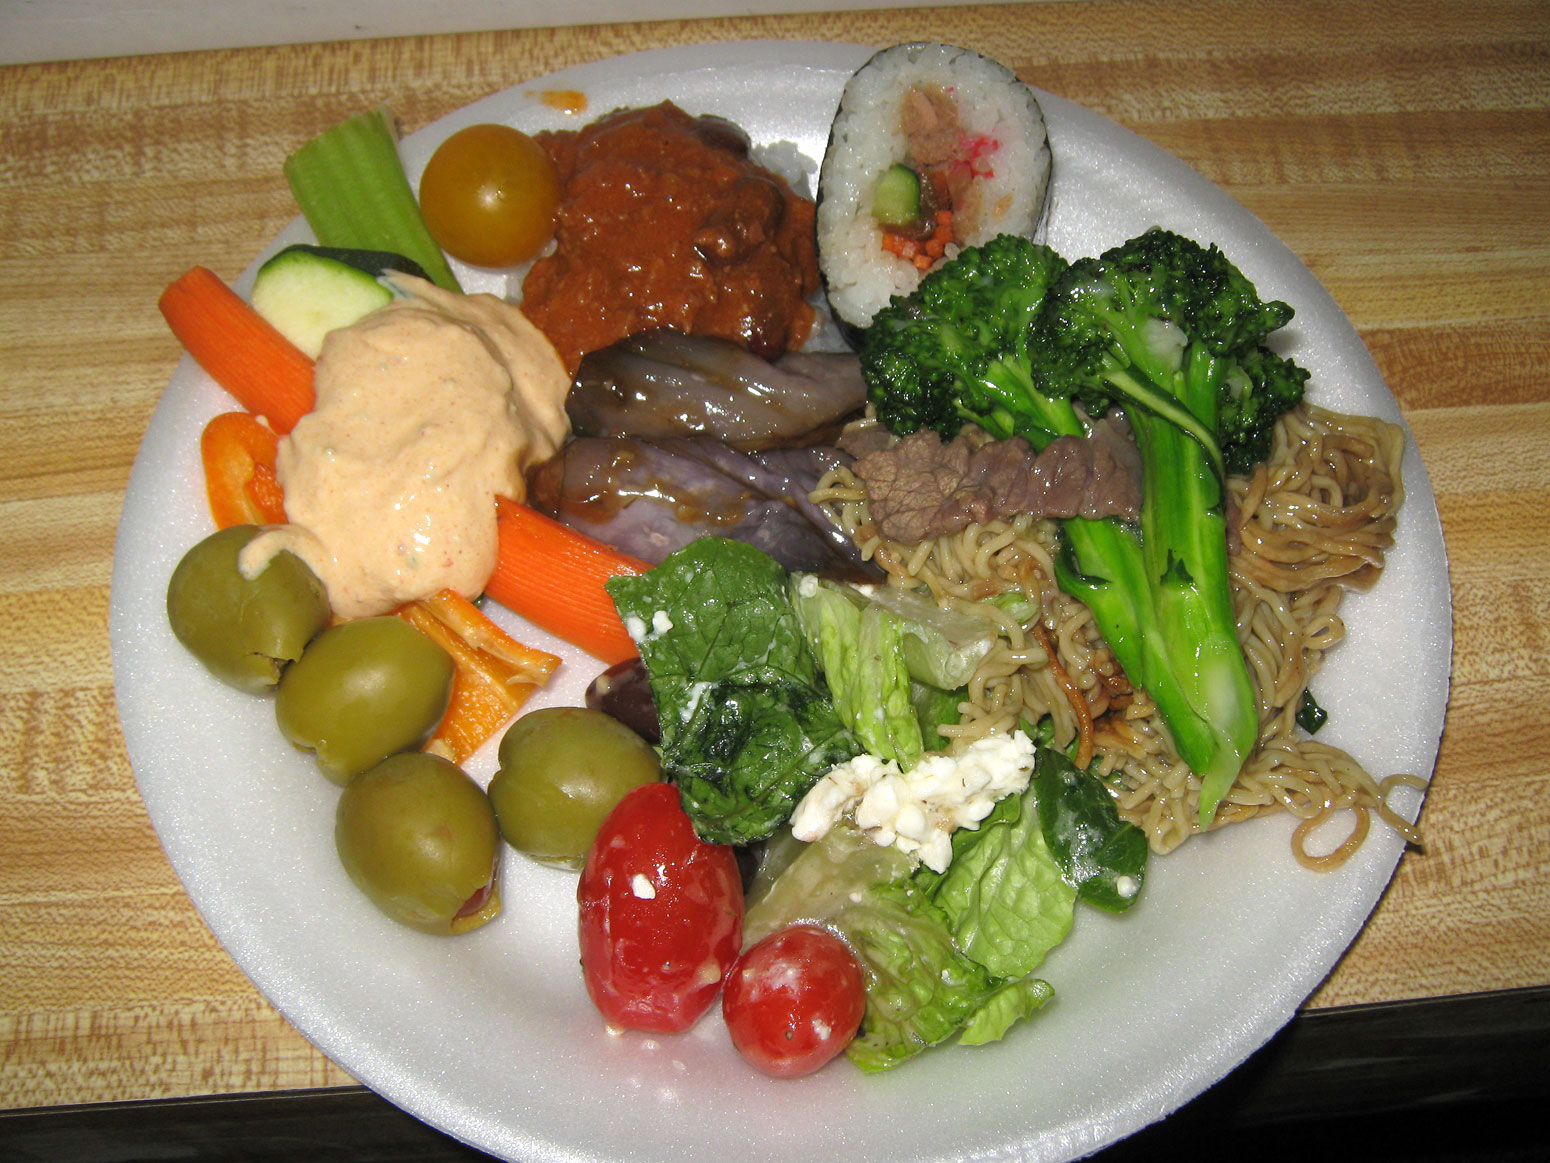 Diner JJ's Aloha 'Oe Potluck – Tasty Island